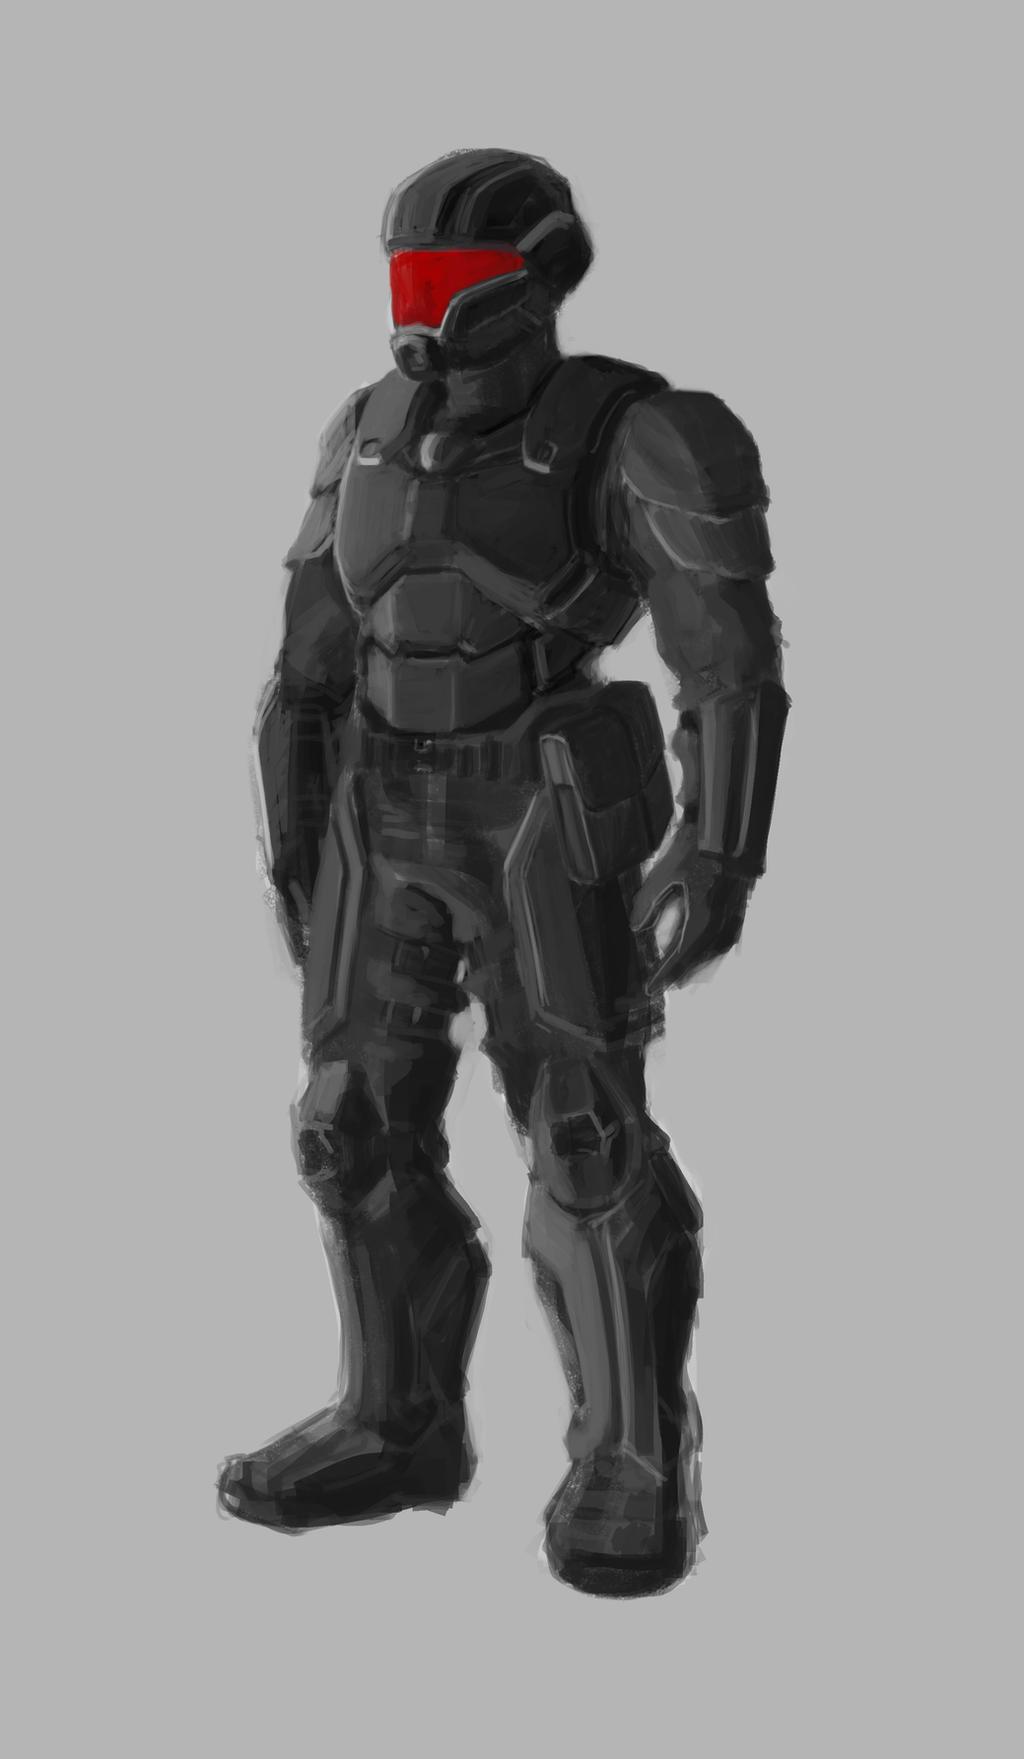 Tiberium Wars: Nod Infantryman by Ranfield